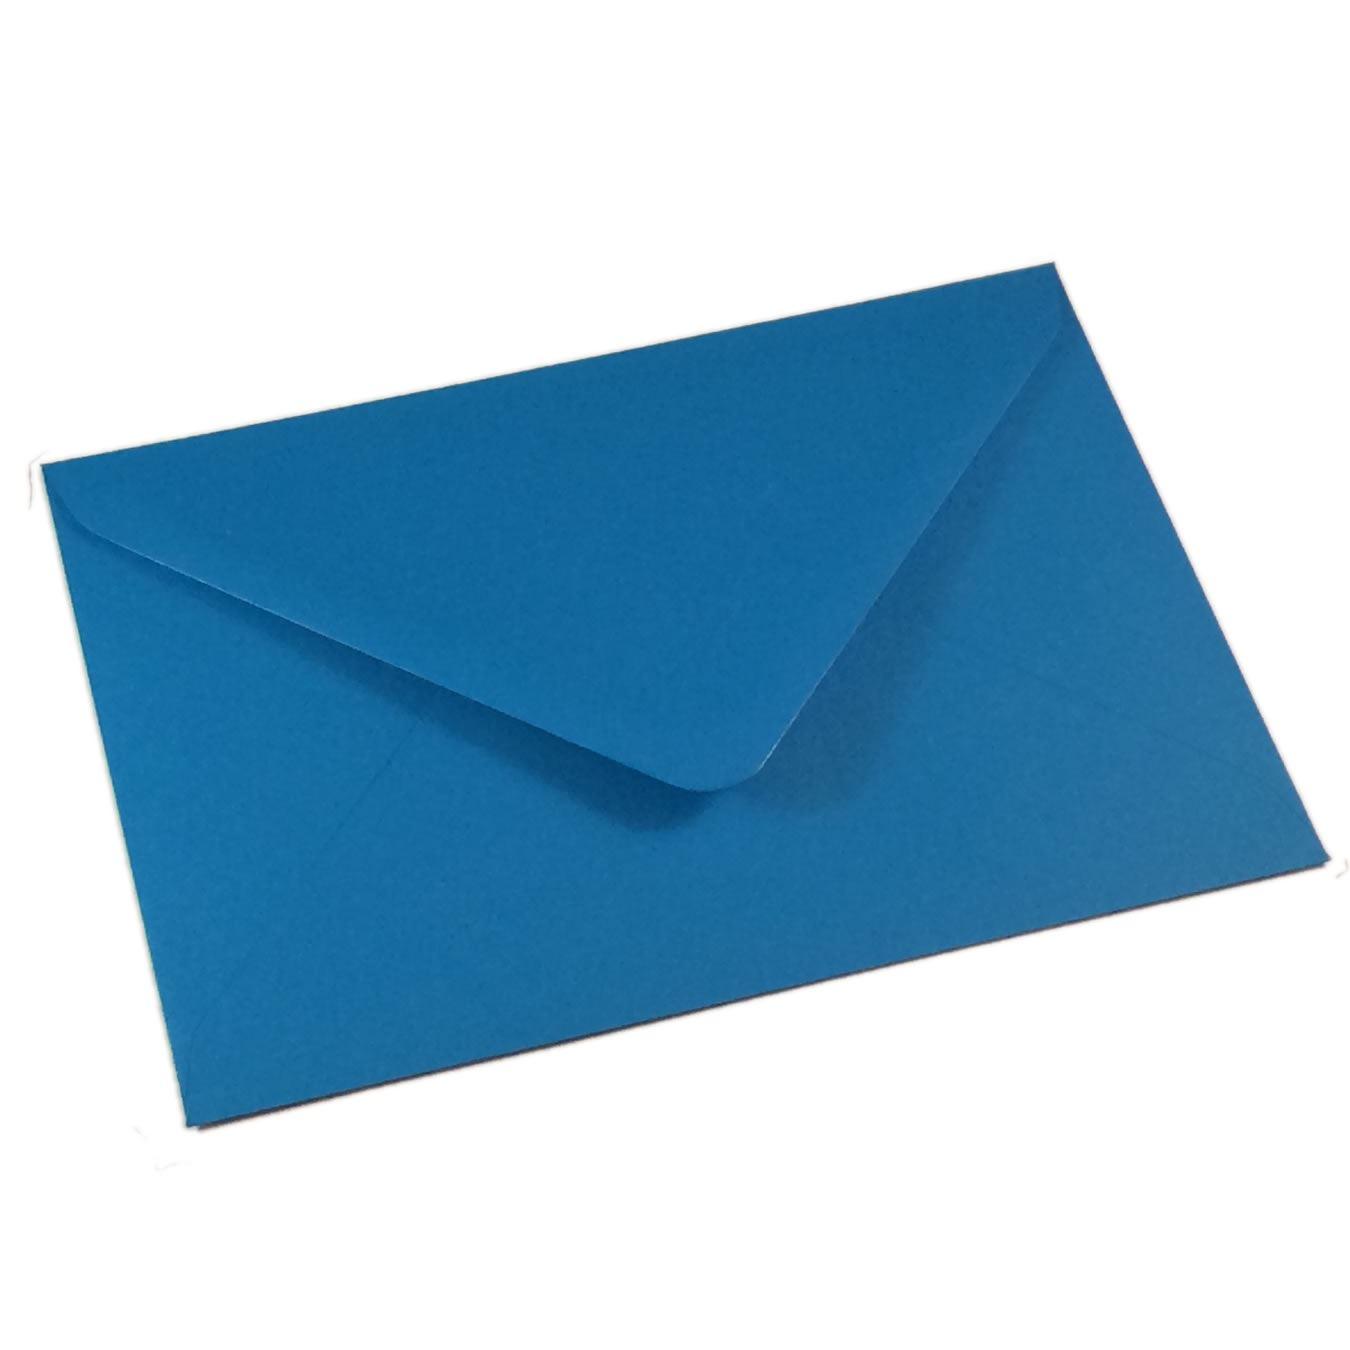 C6 kingfisher blue